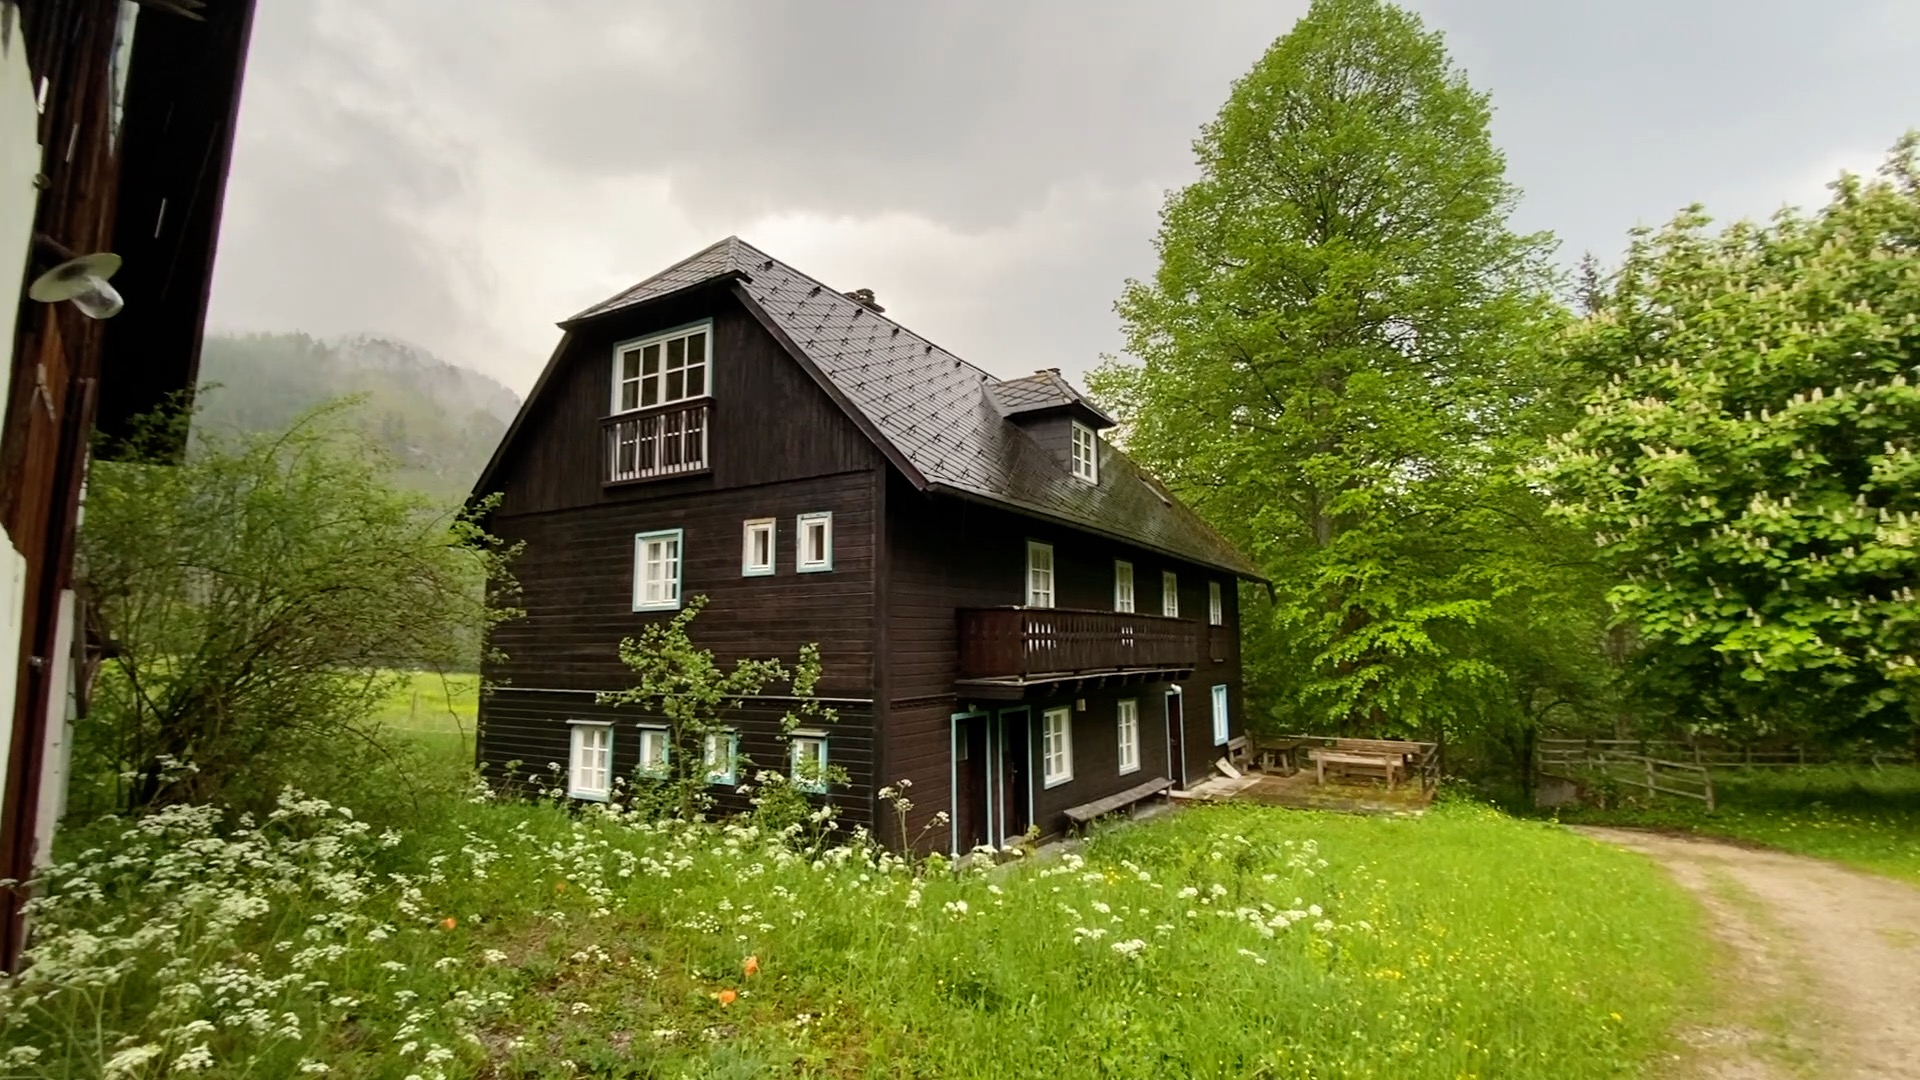 Allerhand aus'm Tyroler Land: Dorf Tirol